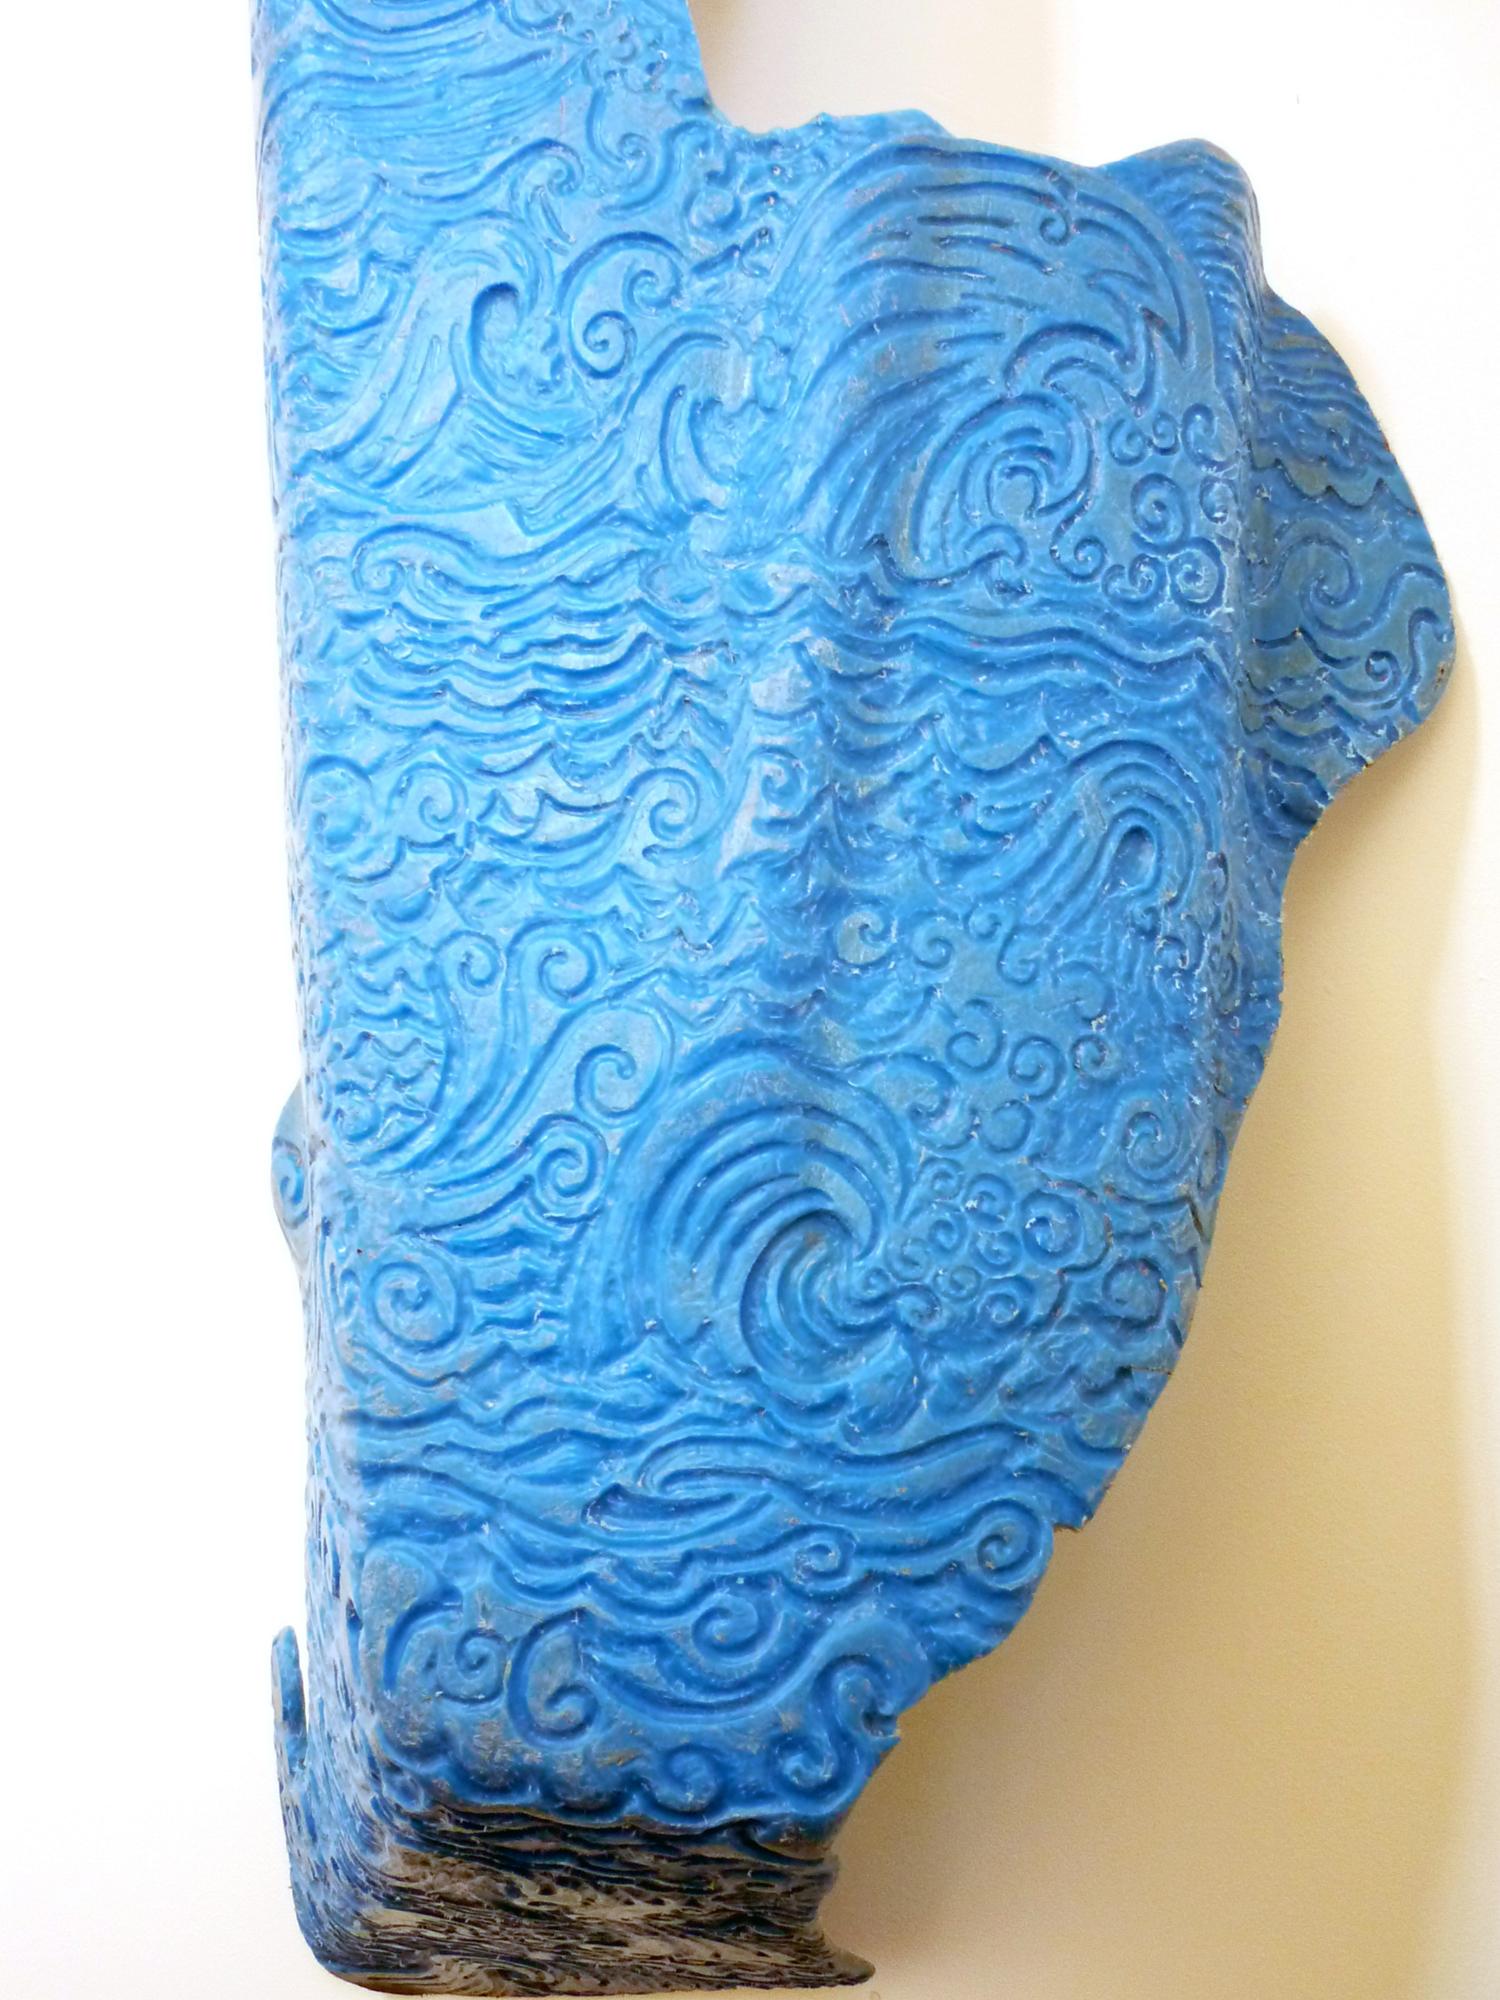 Washed up - blue